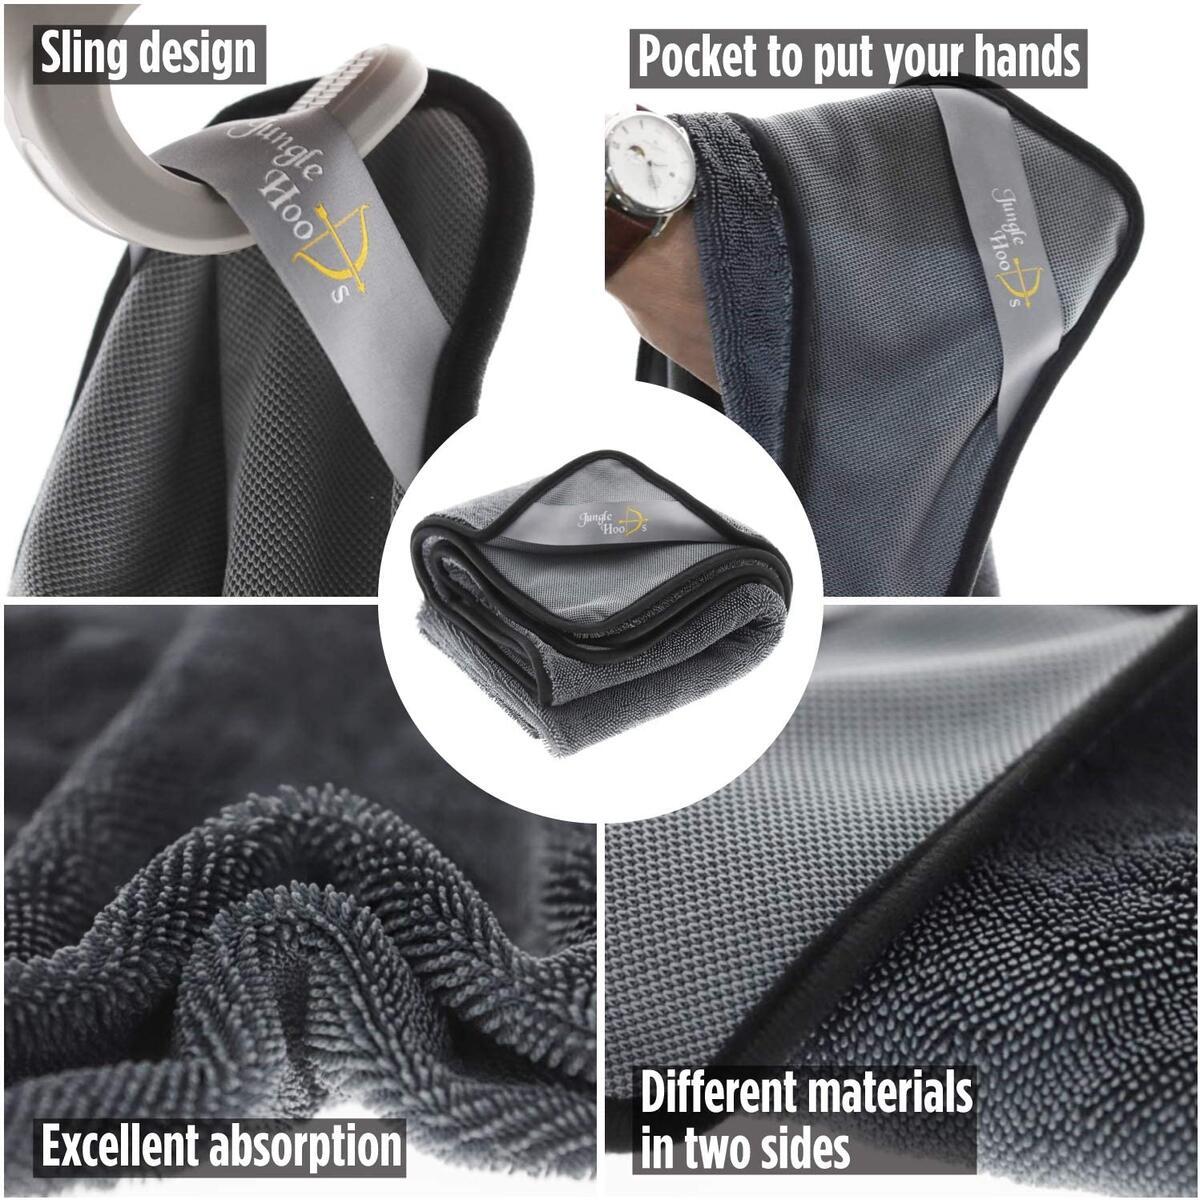 JUNGLE HOODS Premium Big-Size 600GSM Microfiber Super Absorbent Hand Pocket Drying Towel Convenient Handling Car Wash Rag (Gray, 2 in 1 Pack) (31.5 x 31.5 inch) (15.7 x 15.7 inch)